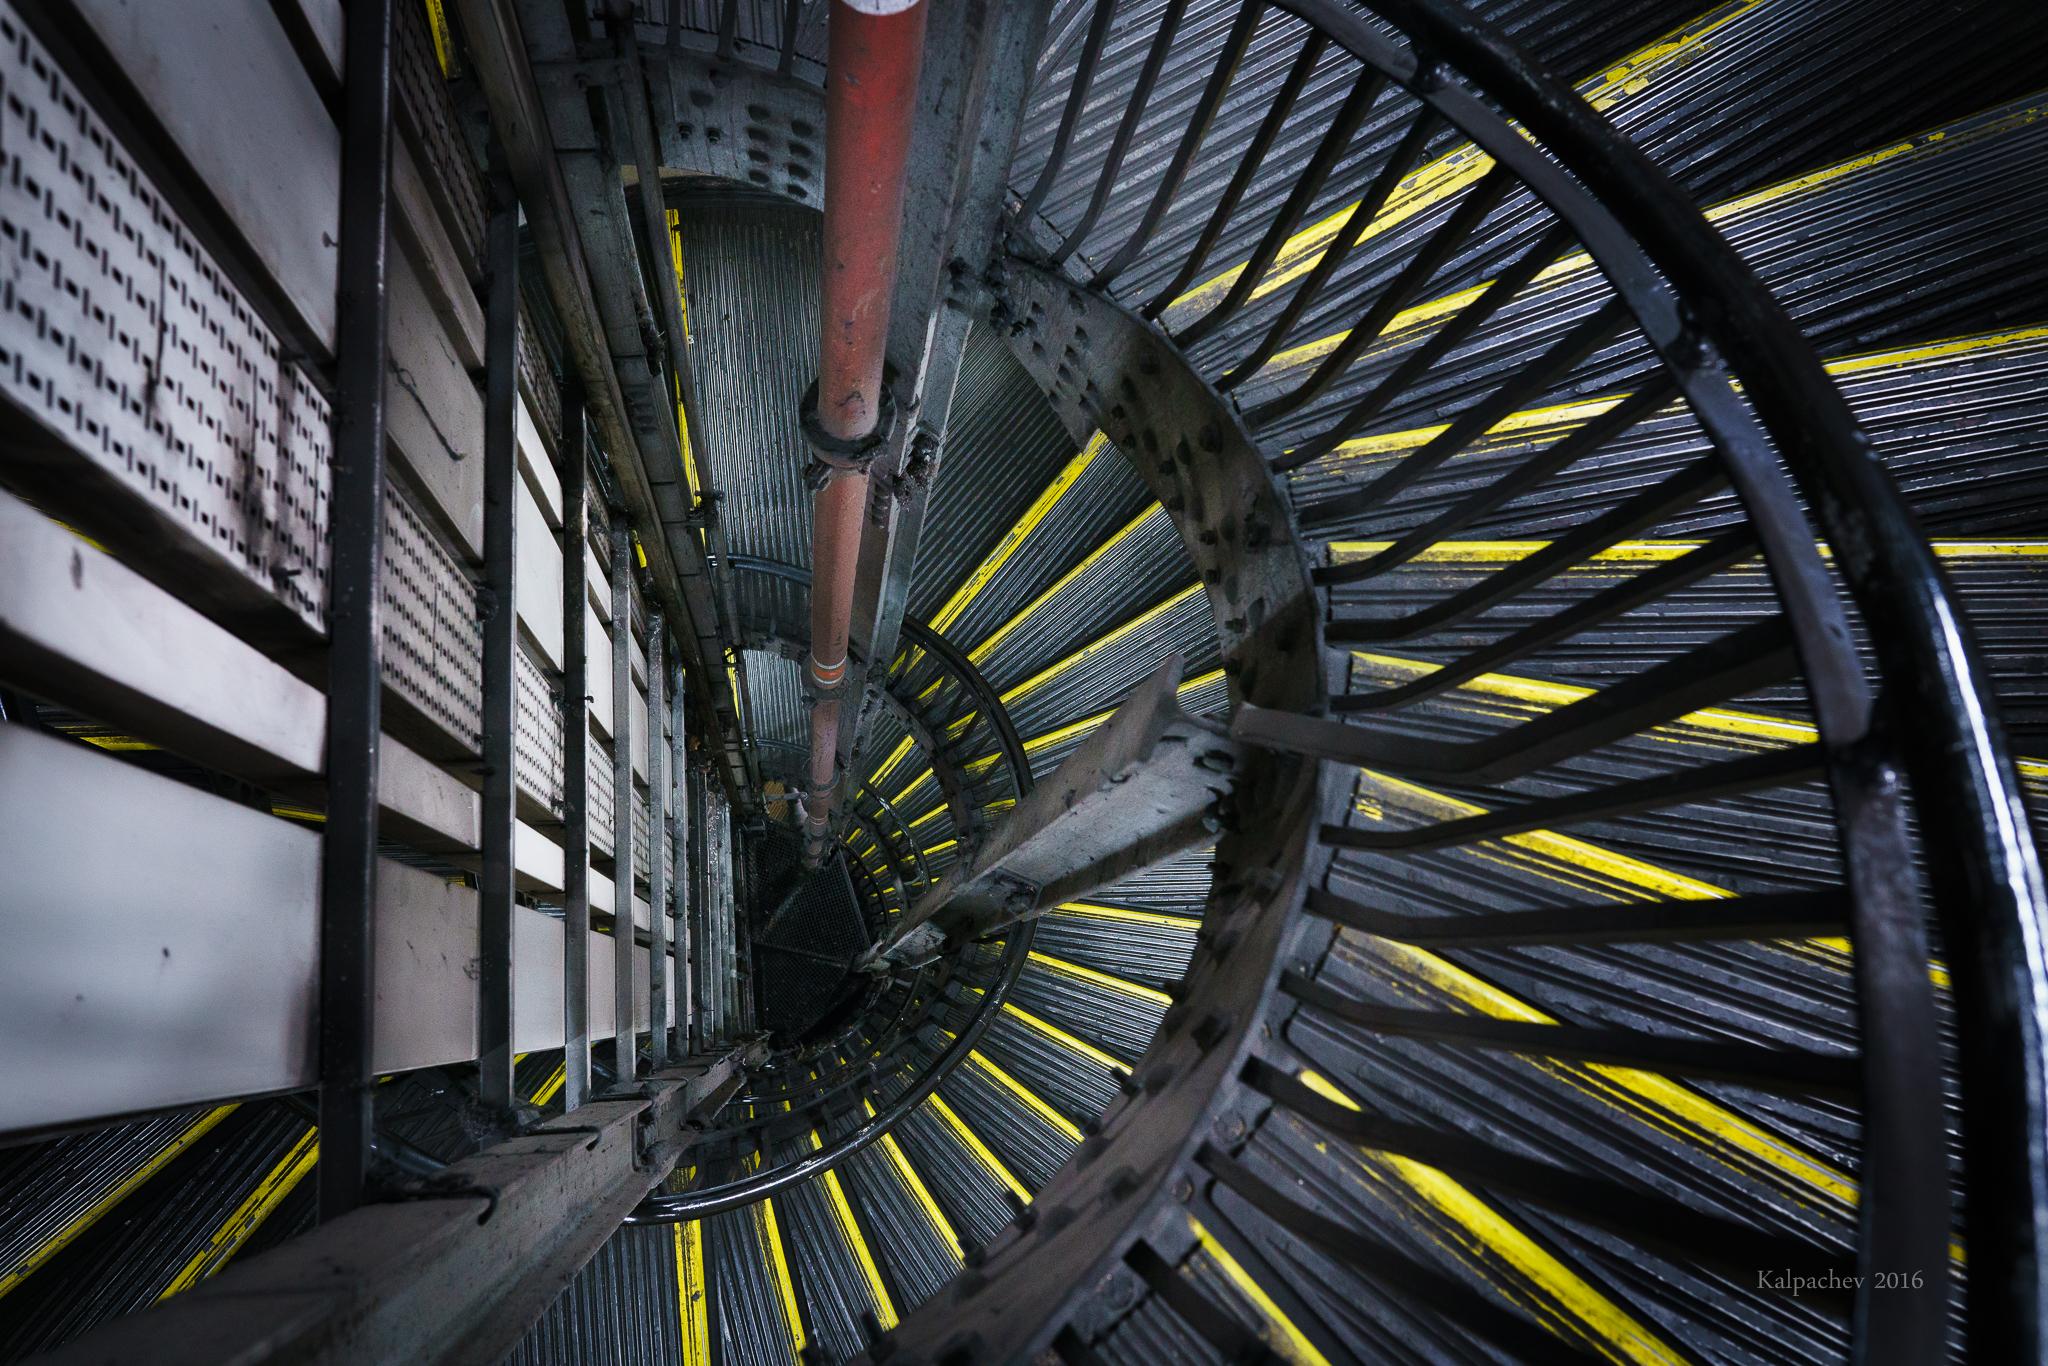 Bayswater Tube Station #London #underground #station